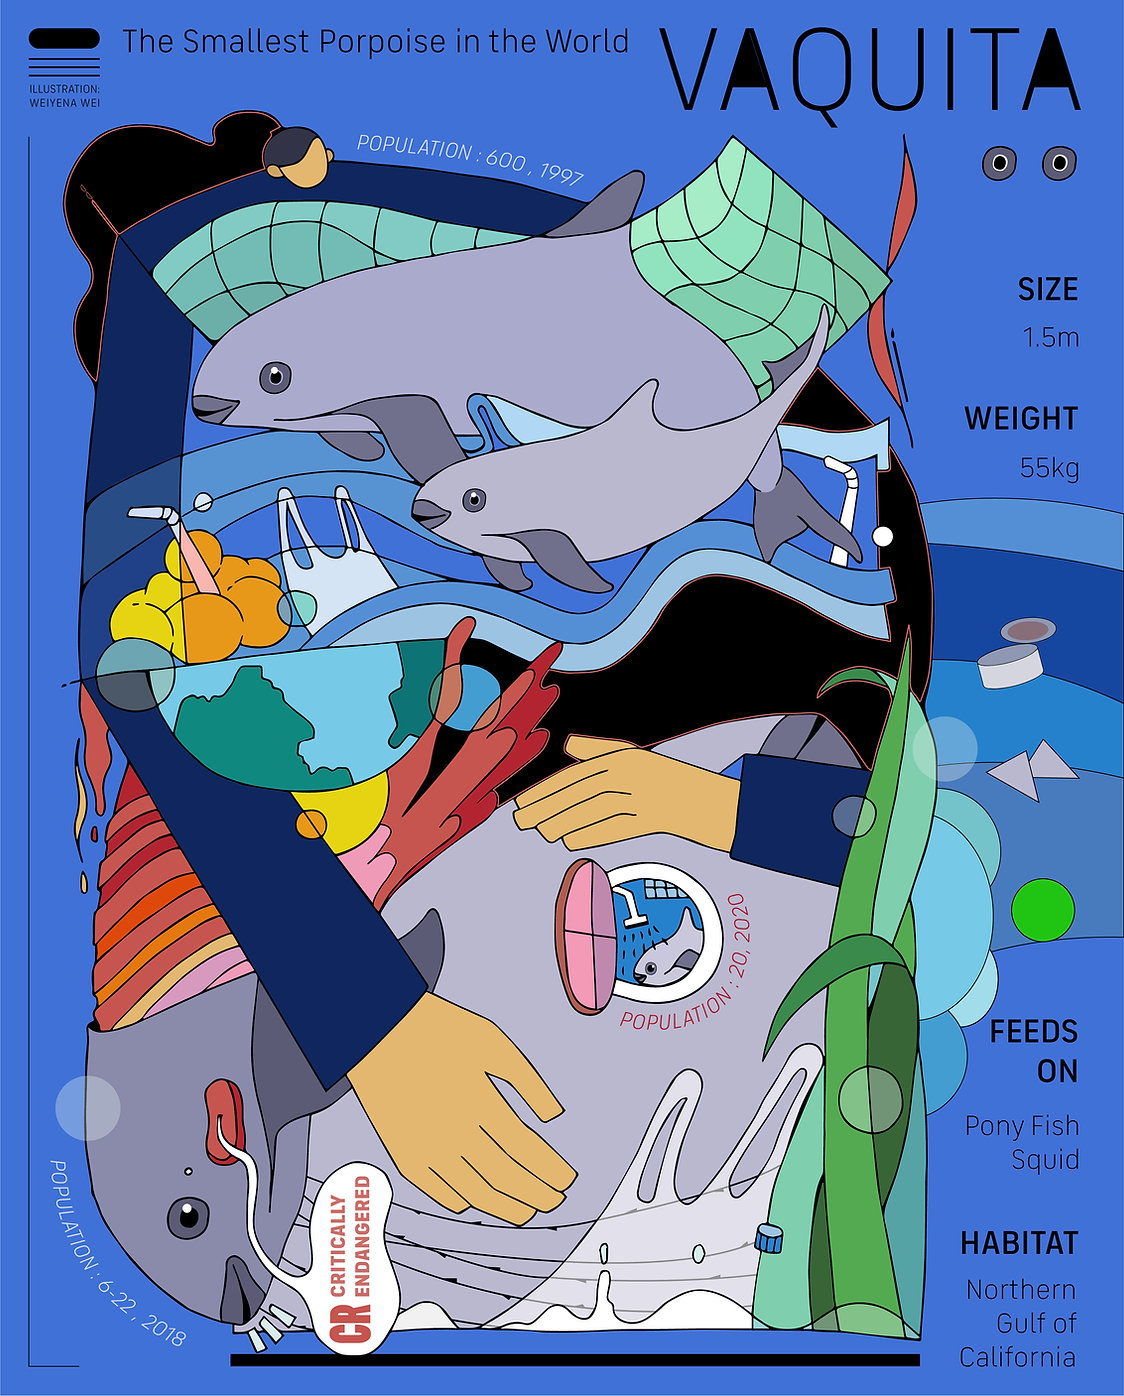 Vaquita Poster.jpg